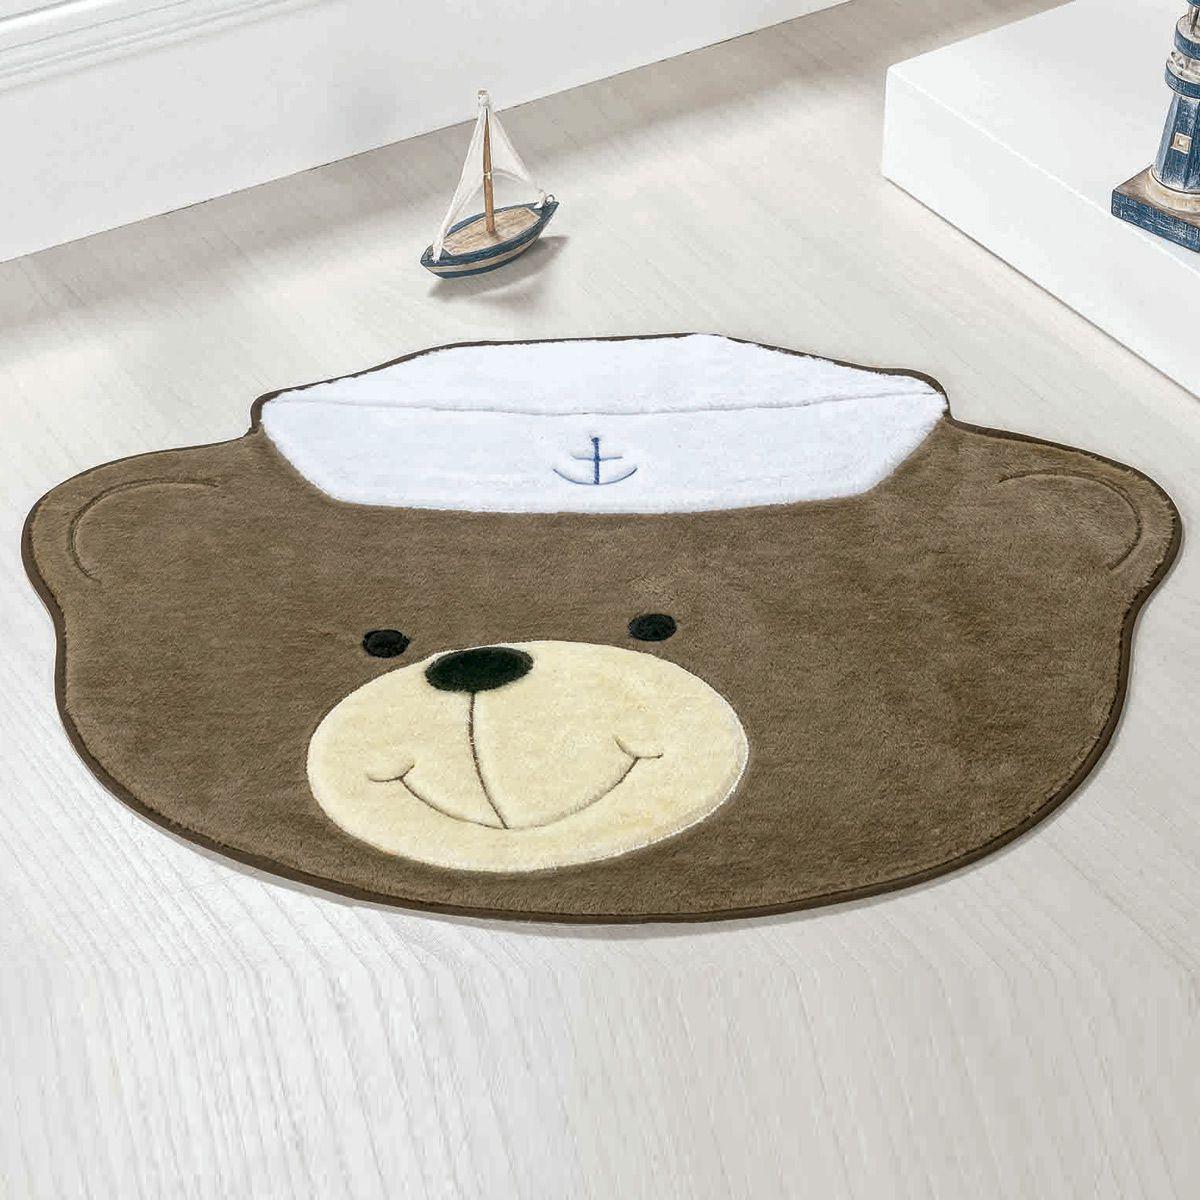 Tapete Infantil Premium Baby Formato Urso-Marinheiro Castor 78cm x 58cm